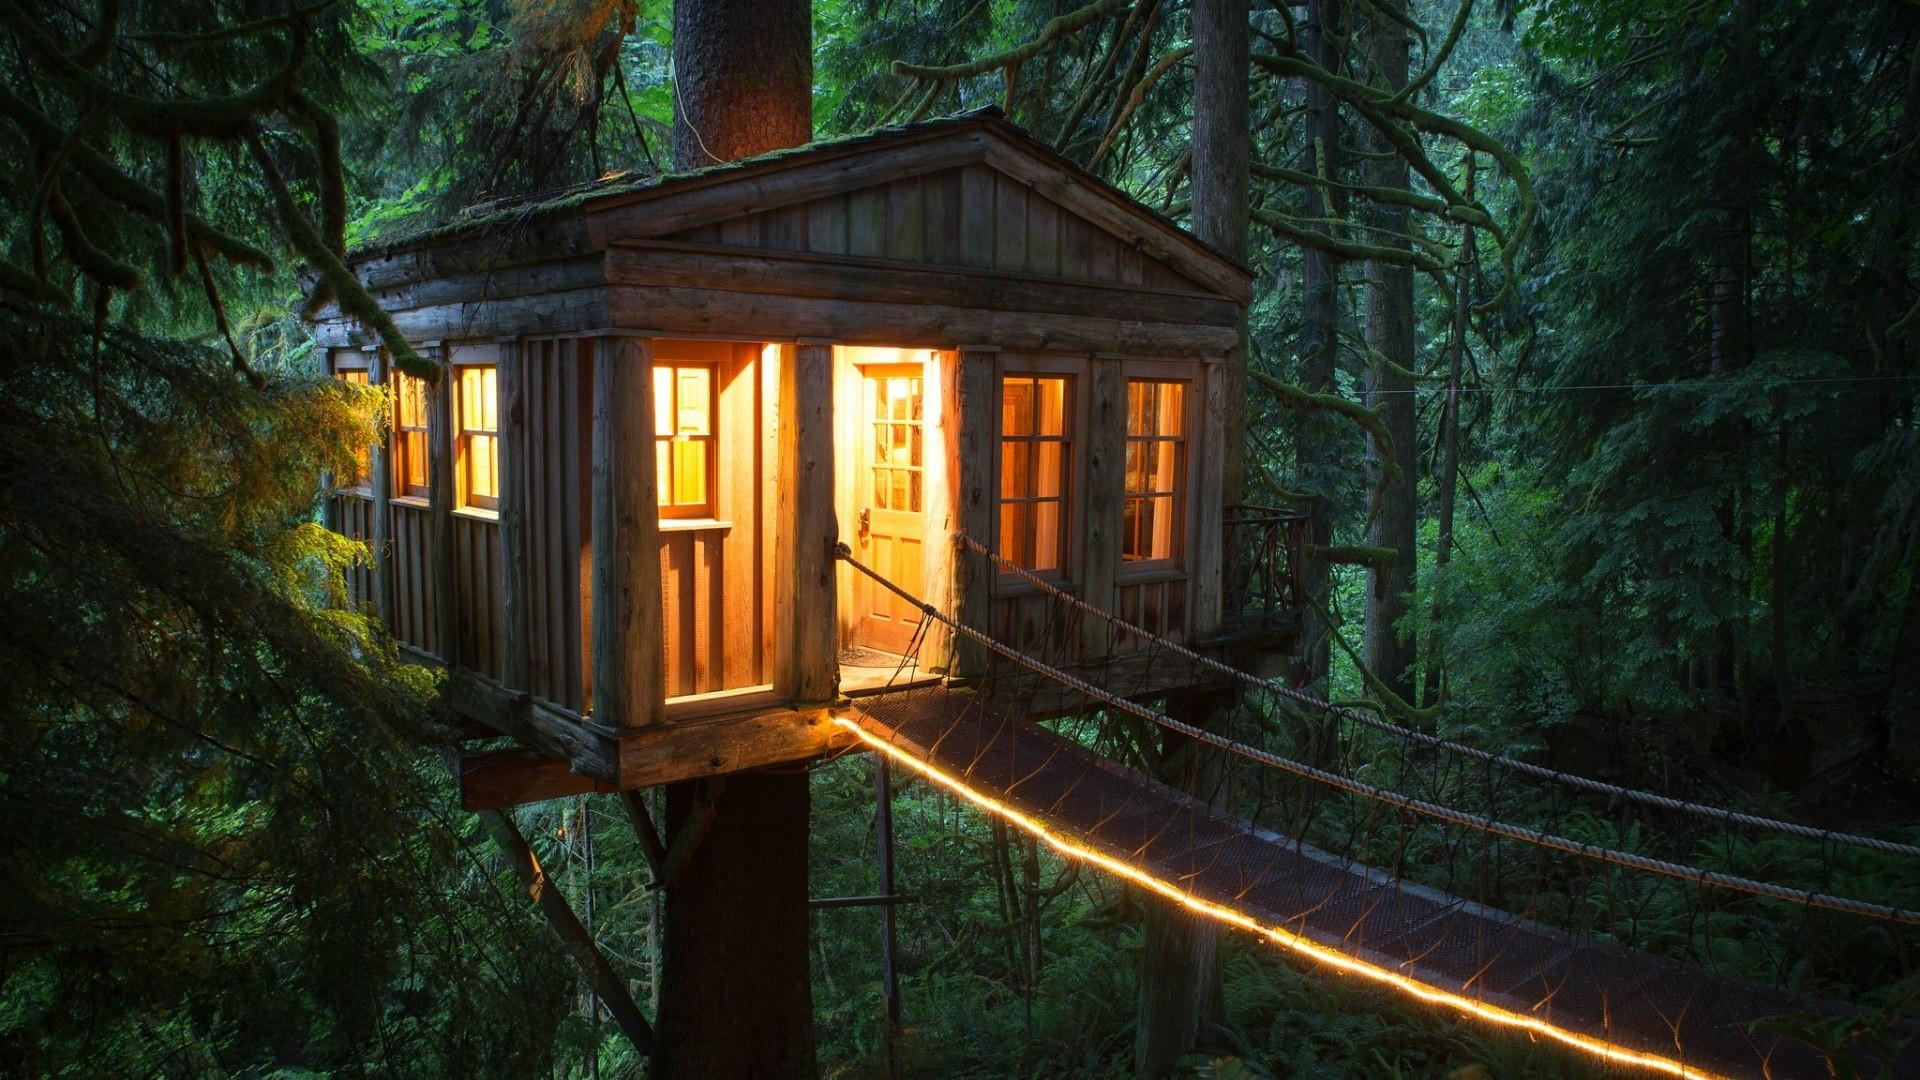 дом на окраине леса картинки для